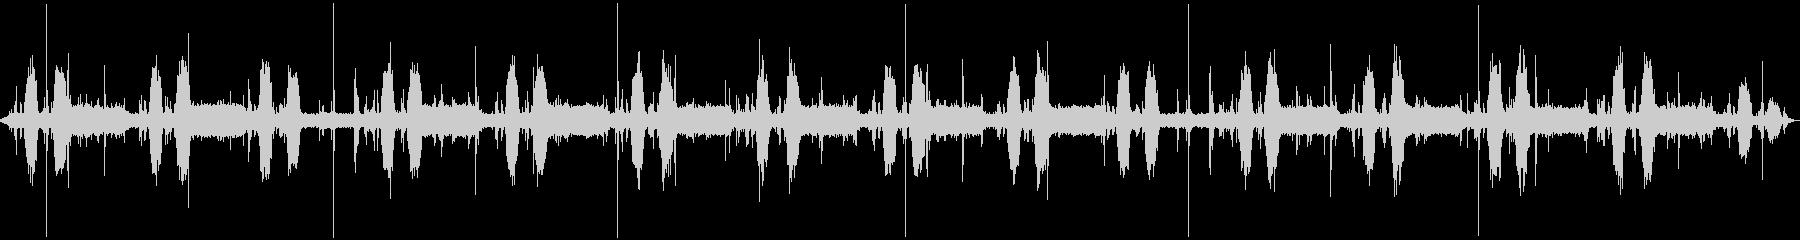 CDハンドリングマシン:ランニング...の未再生の波形